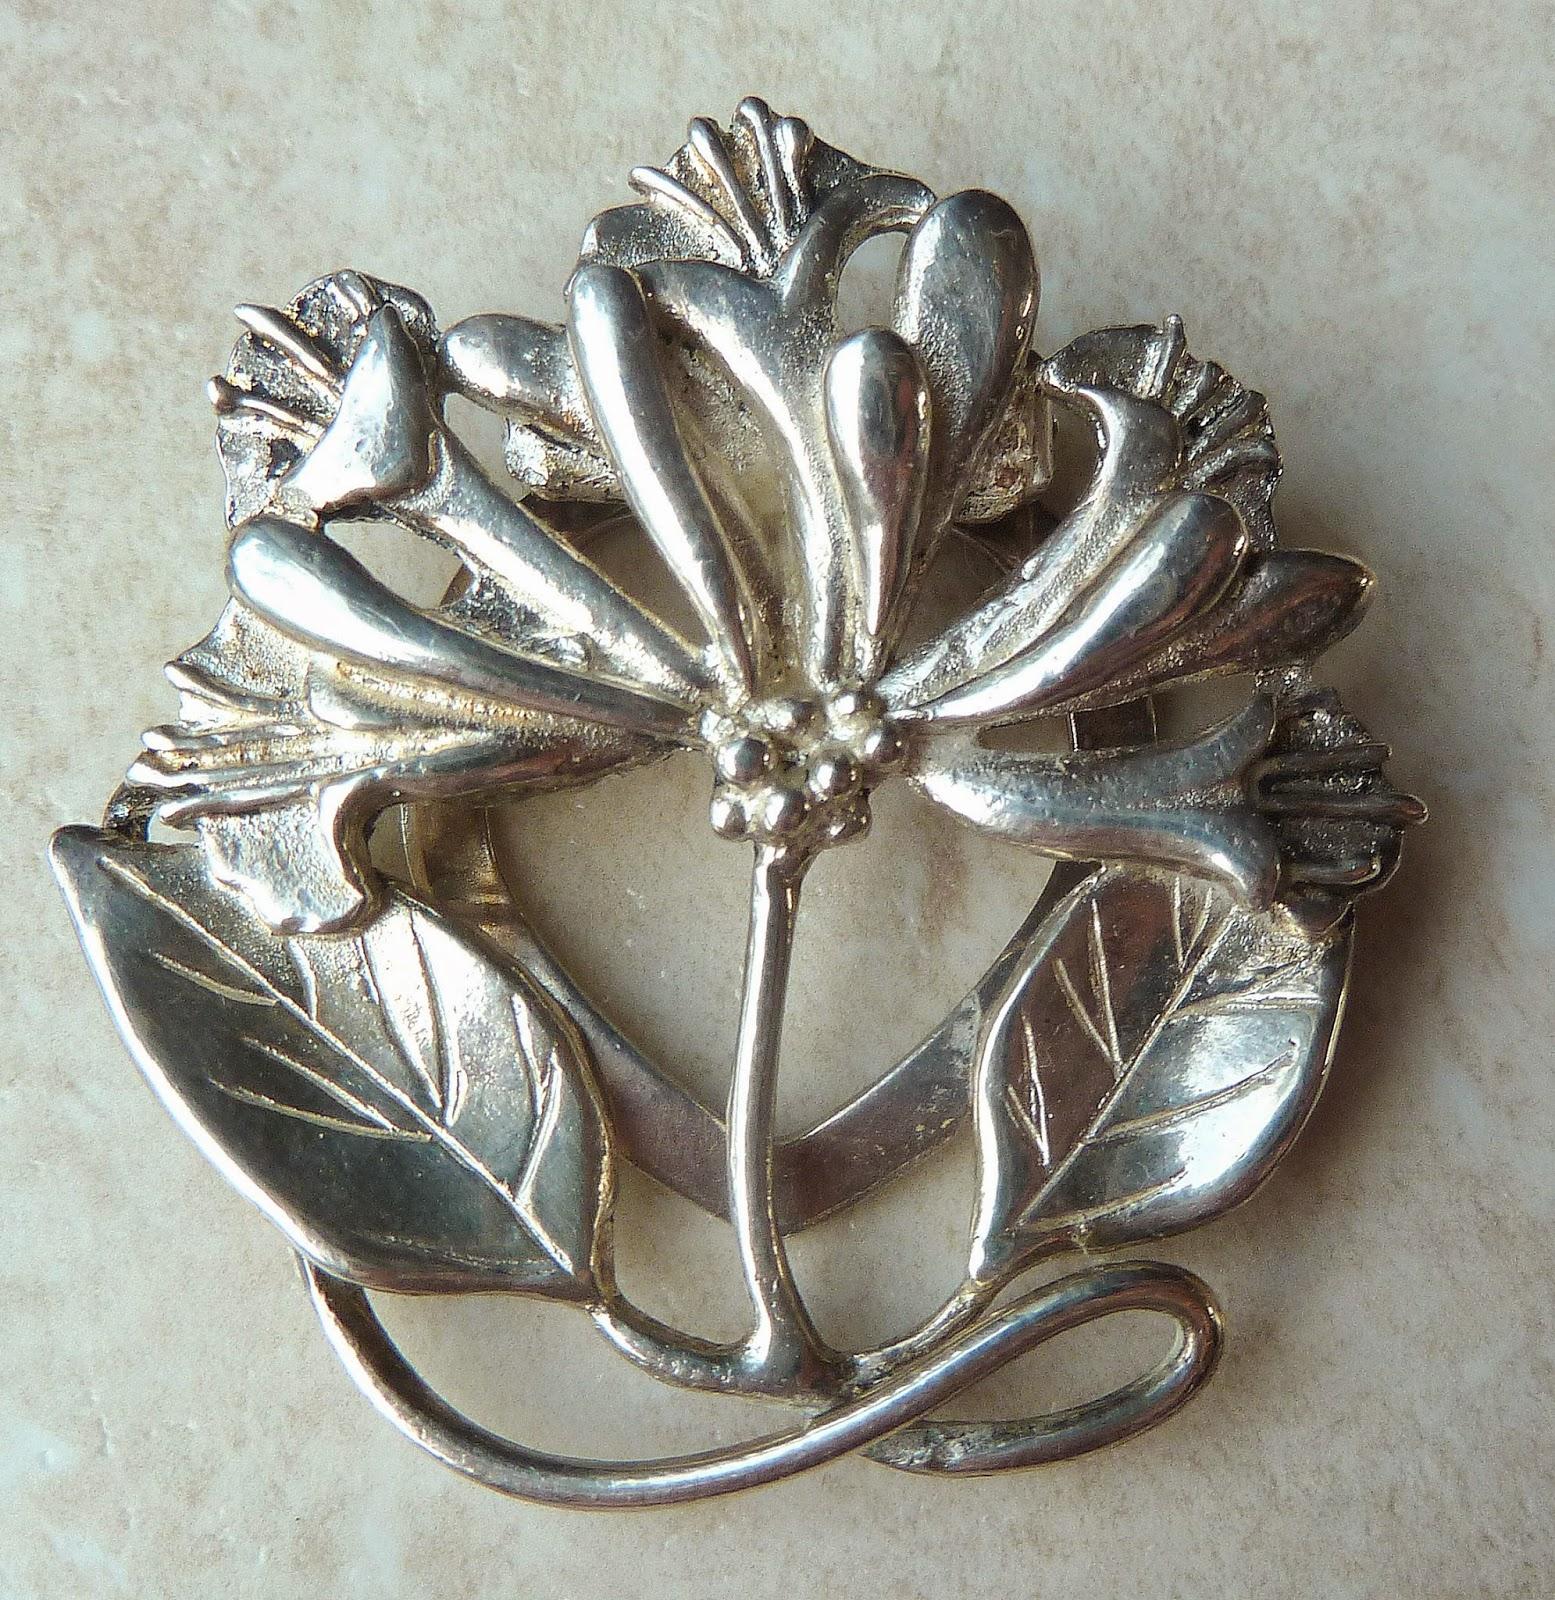 http://www.kcavintagegems.uk/vintage-style-floral-scarf-clip-by-masj-396-p.asp